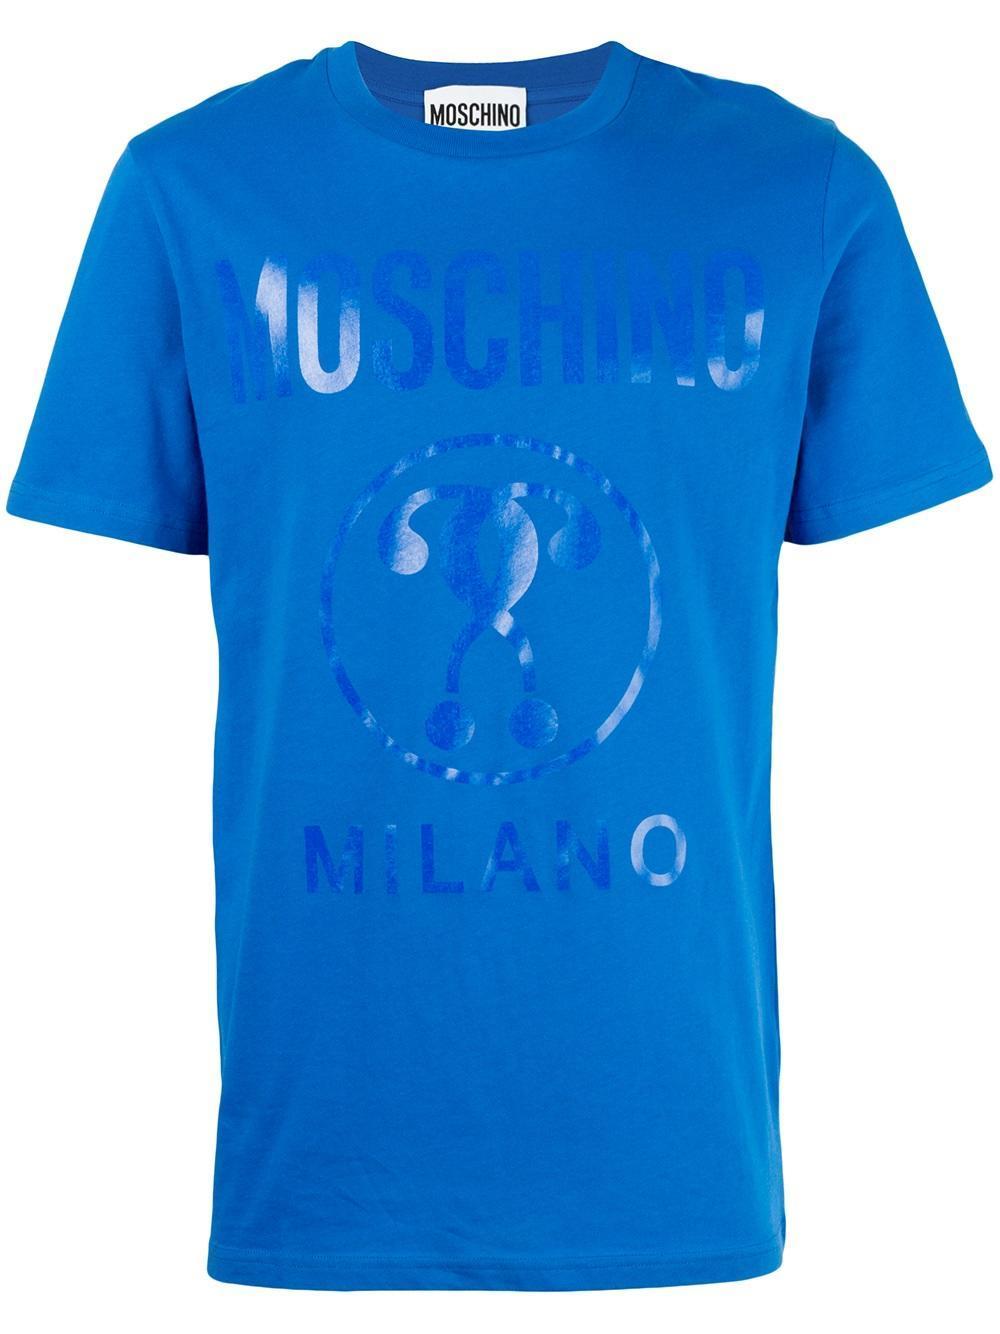 Moschino logo print t shirt in blue for men lyst for Print logo on shirt